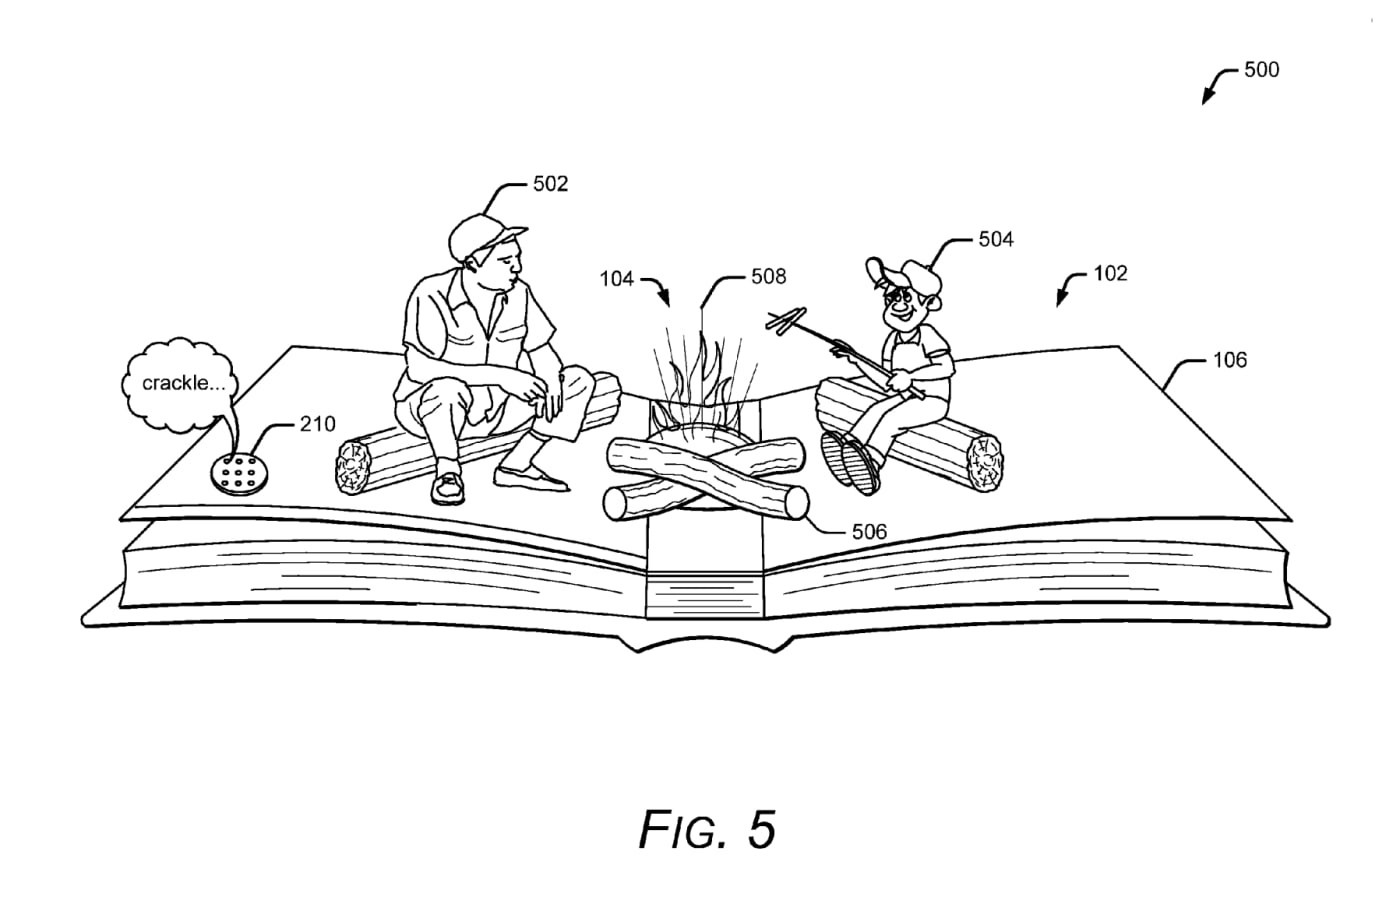 Google Vs Mini Auto Electrical Wiring Diagram 85 Chevy Cucv Alternator Patents Ar Based Pop Up Books